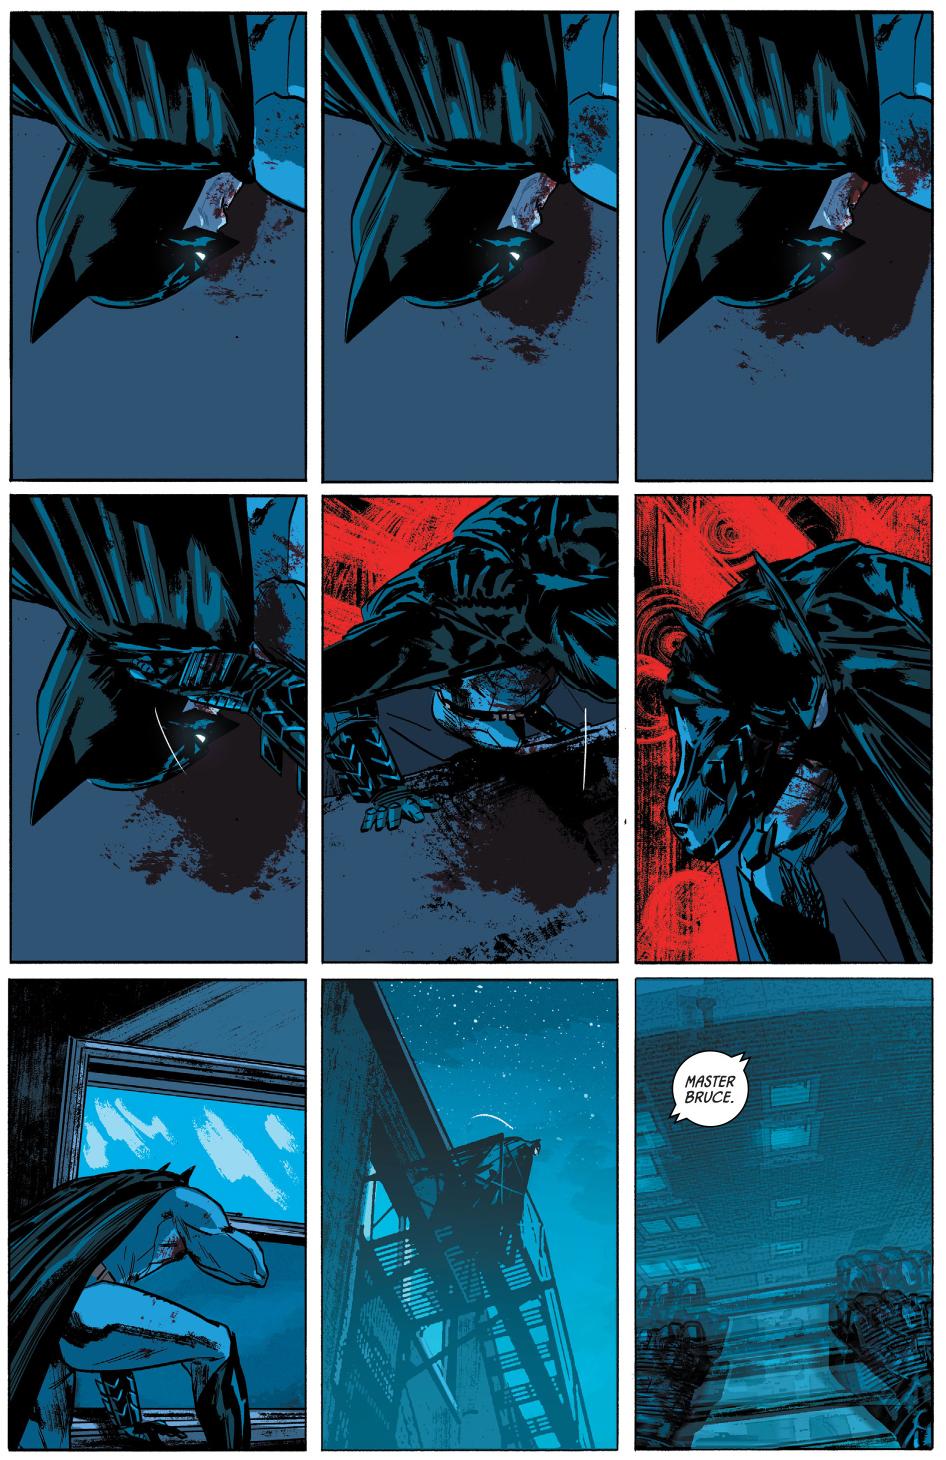 holly-robinson-takes-down-batman